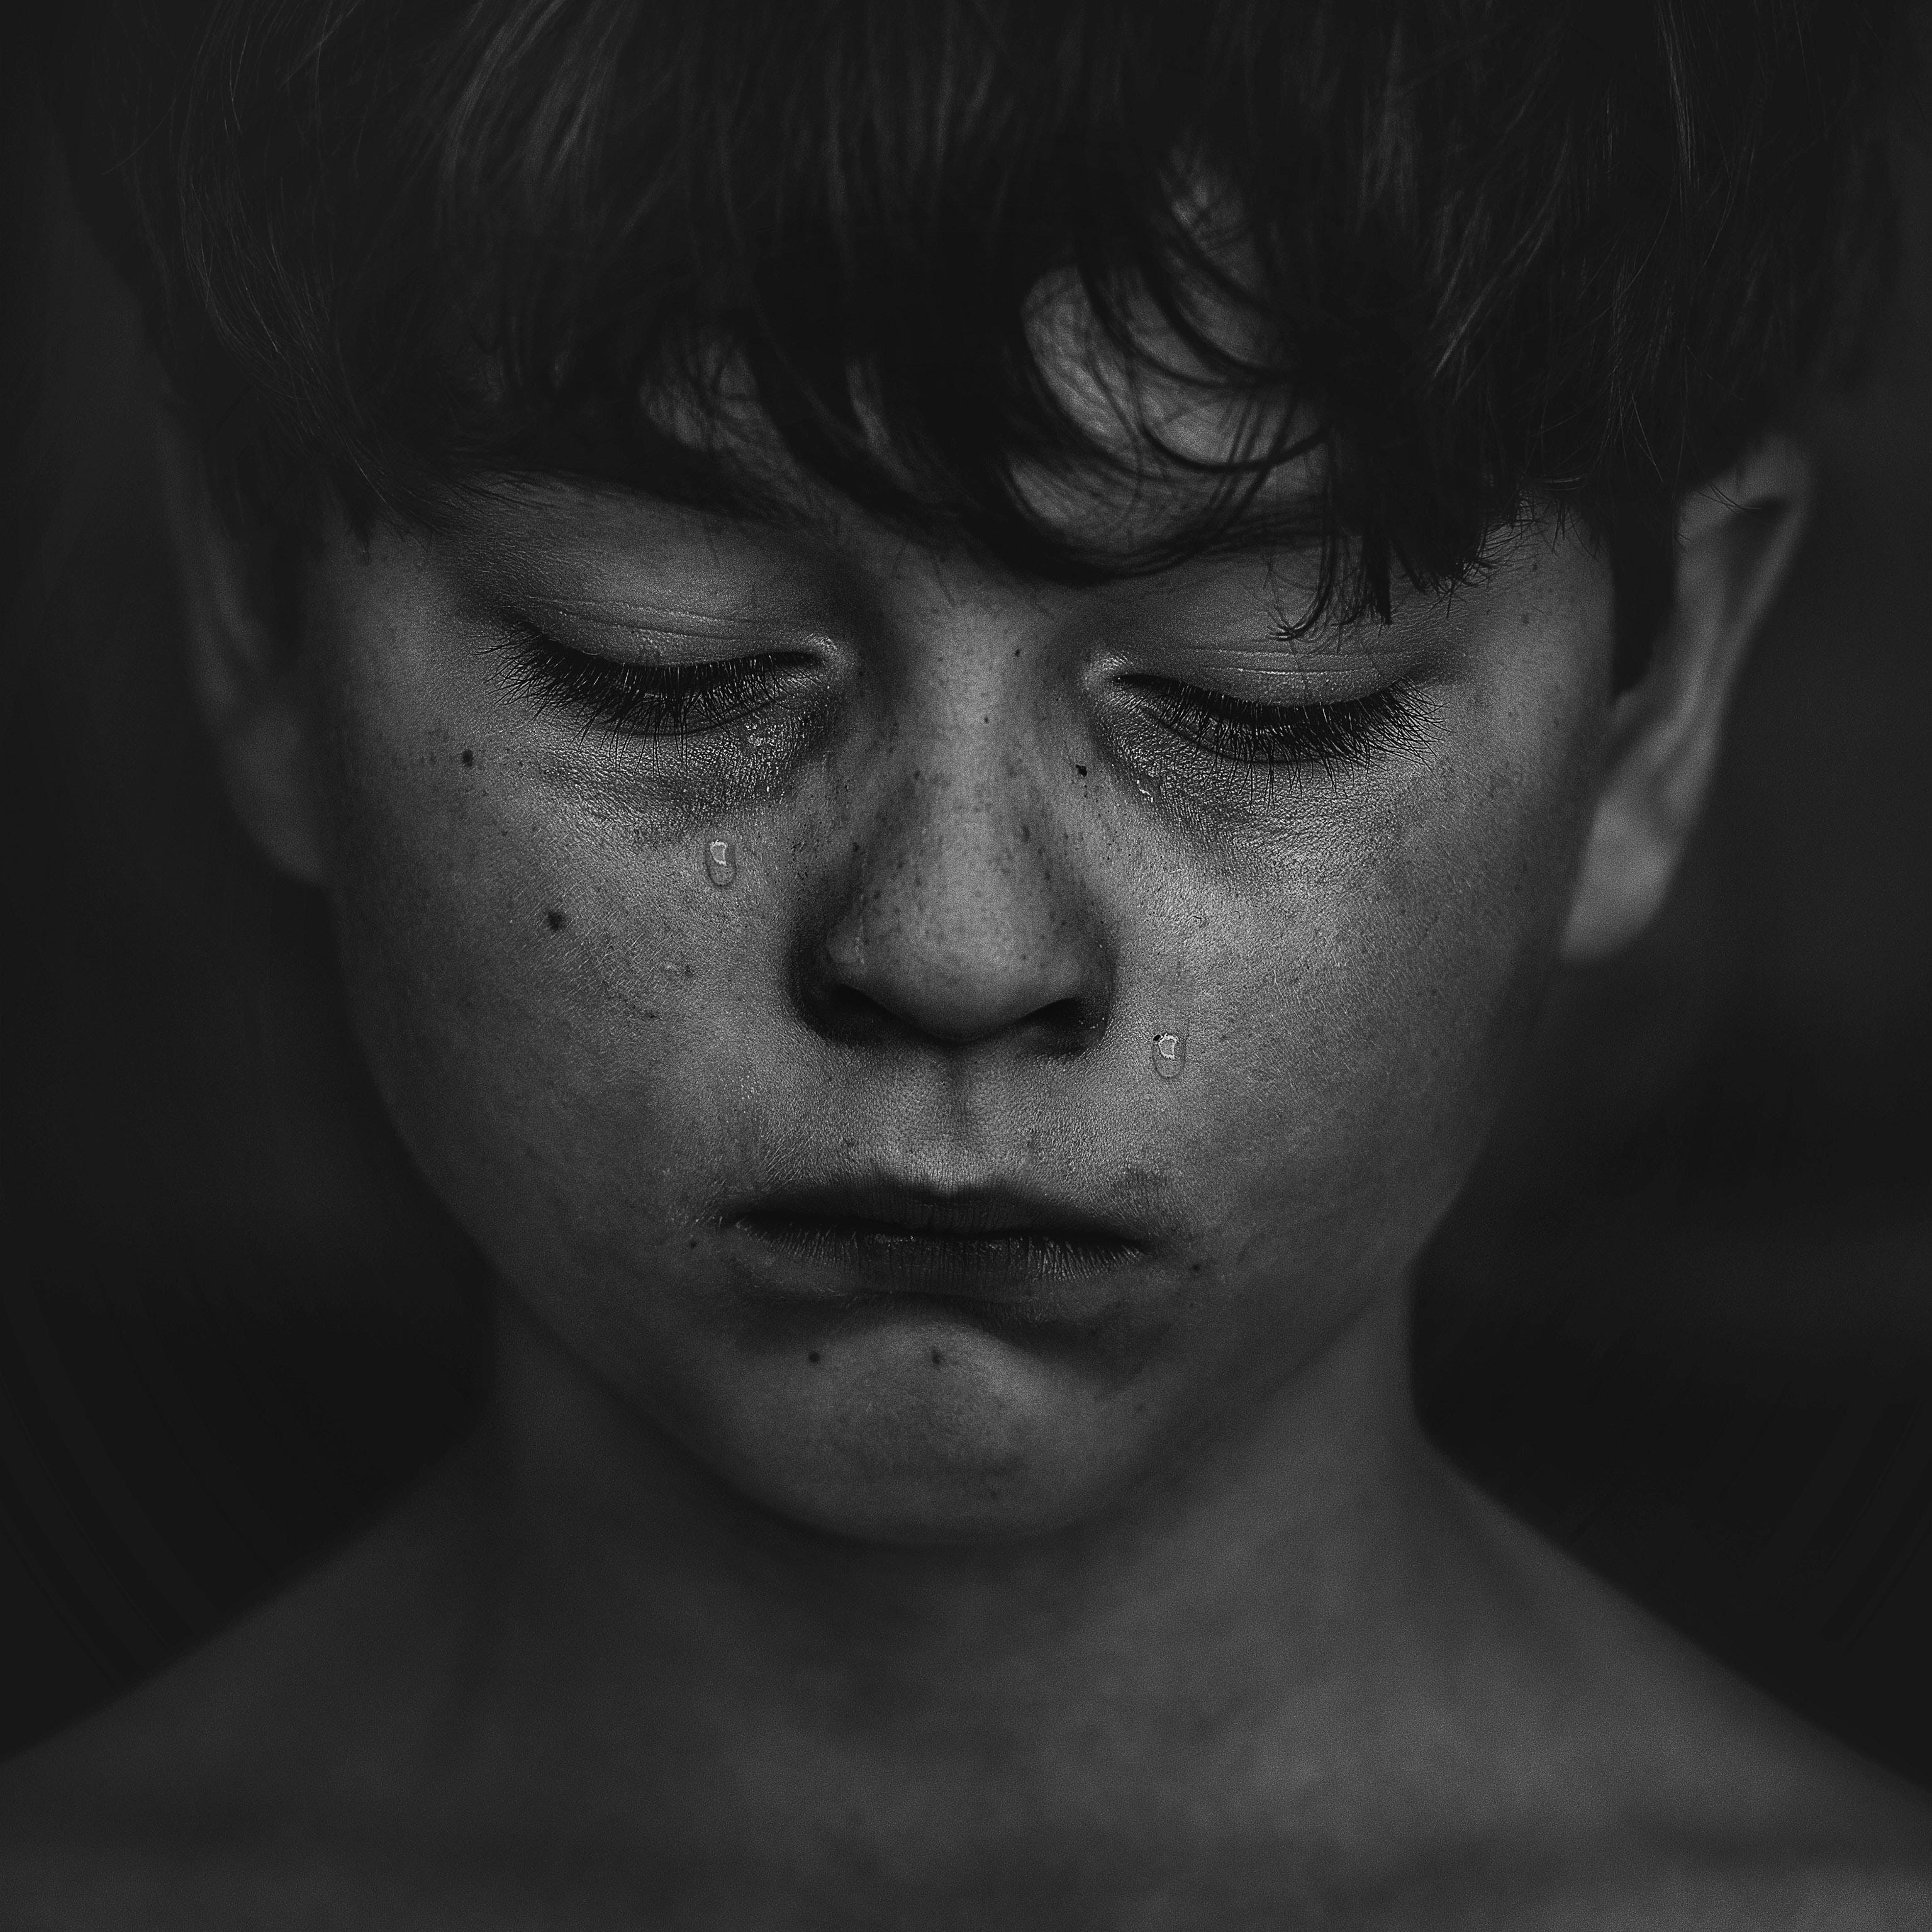 Lack-of-love-towards- children